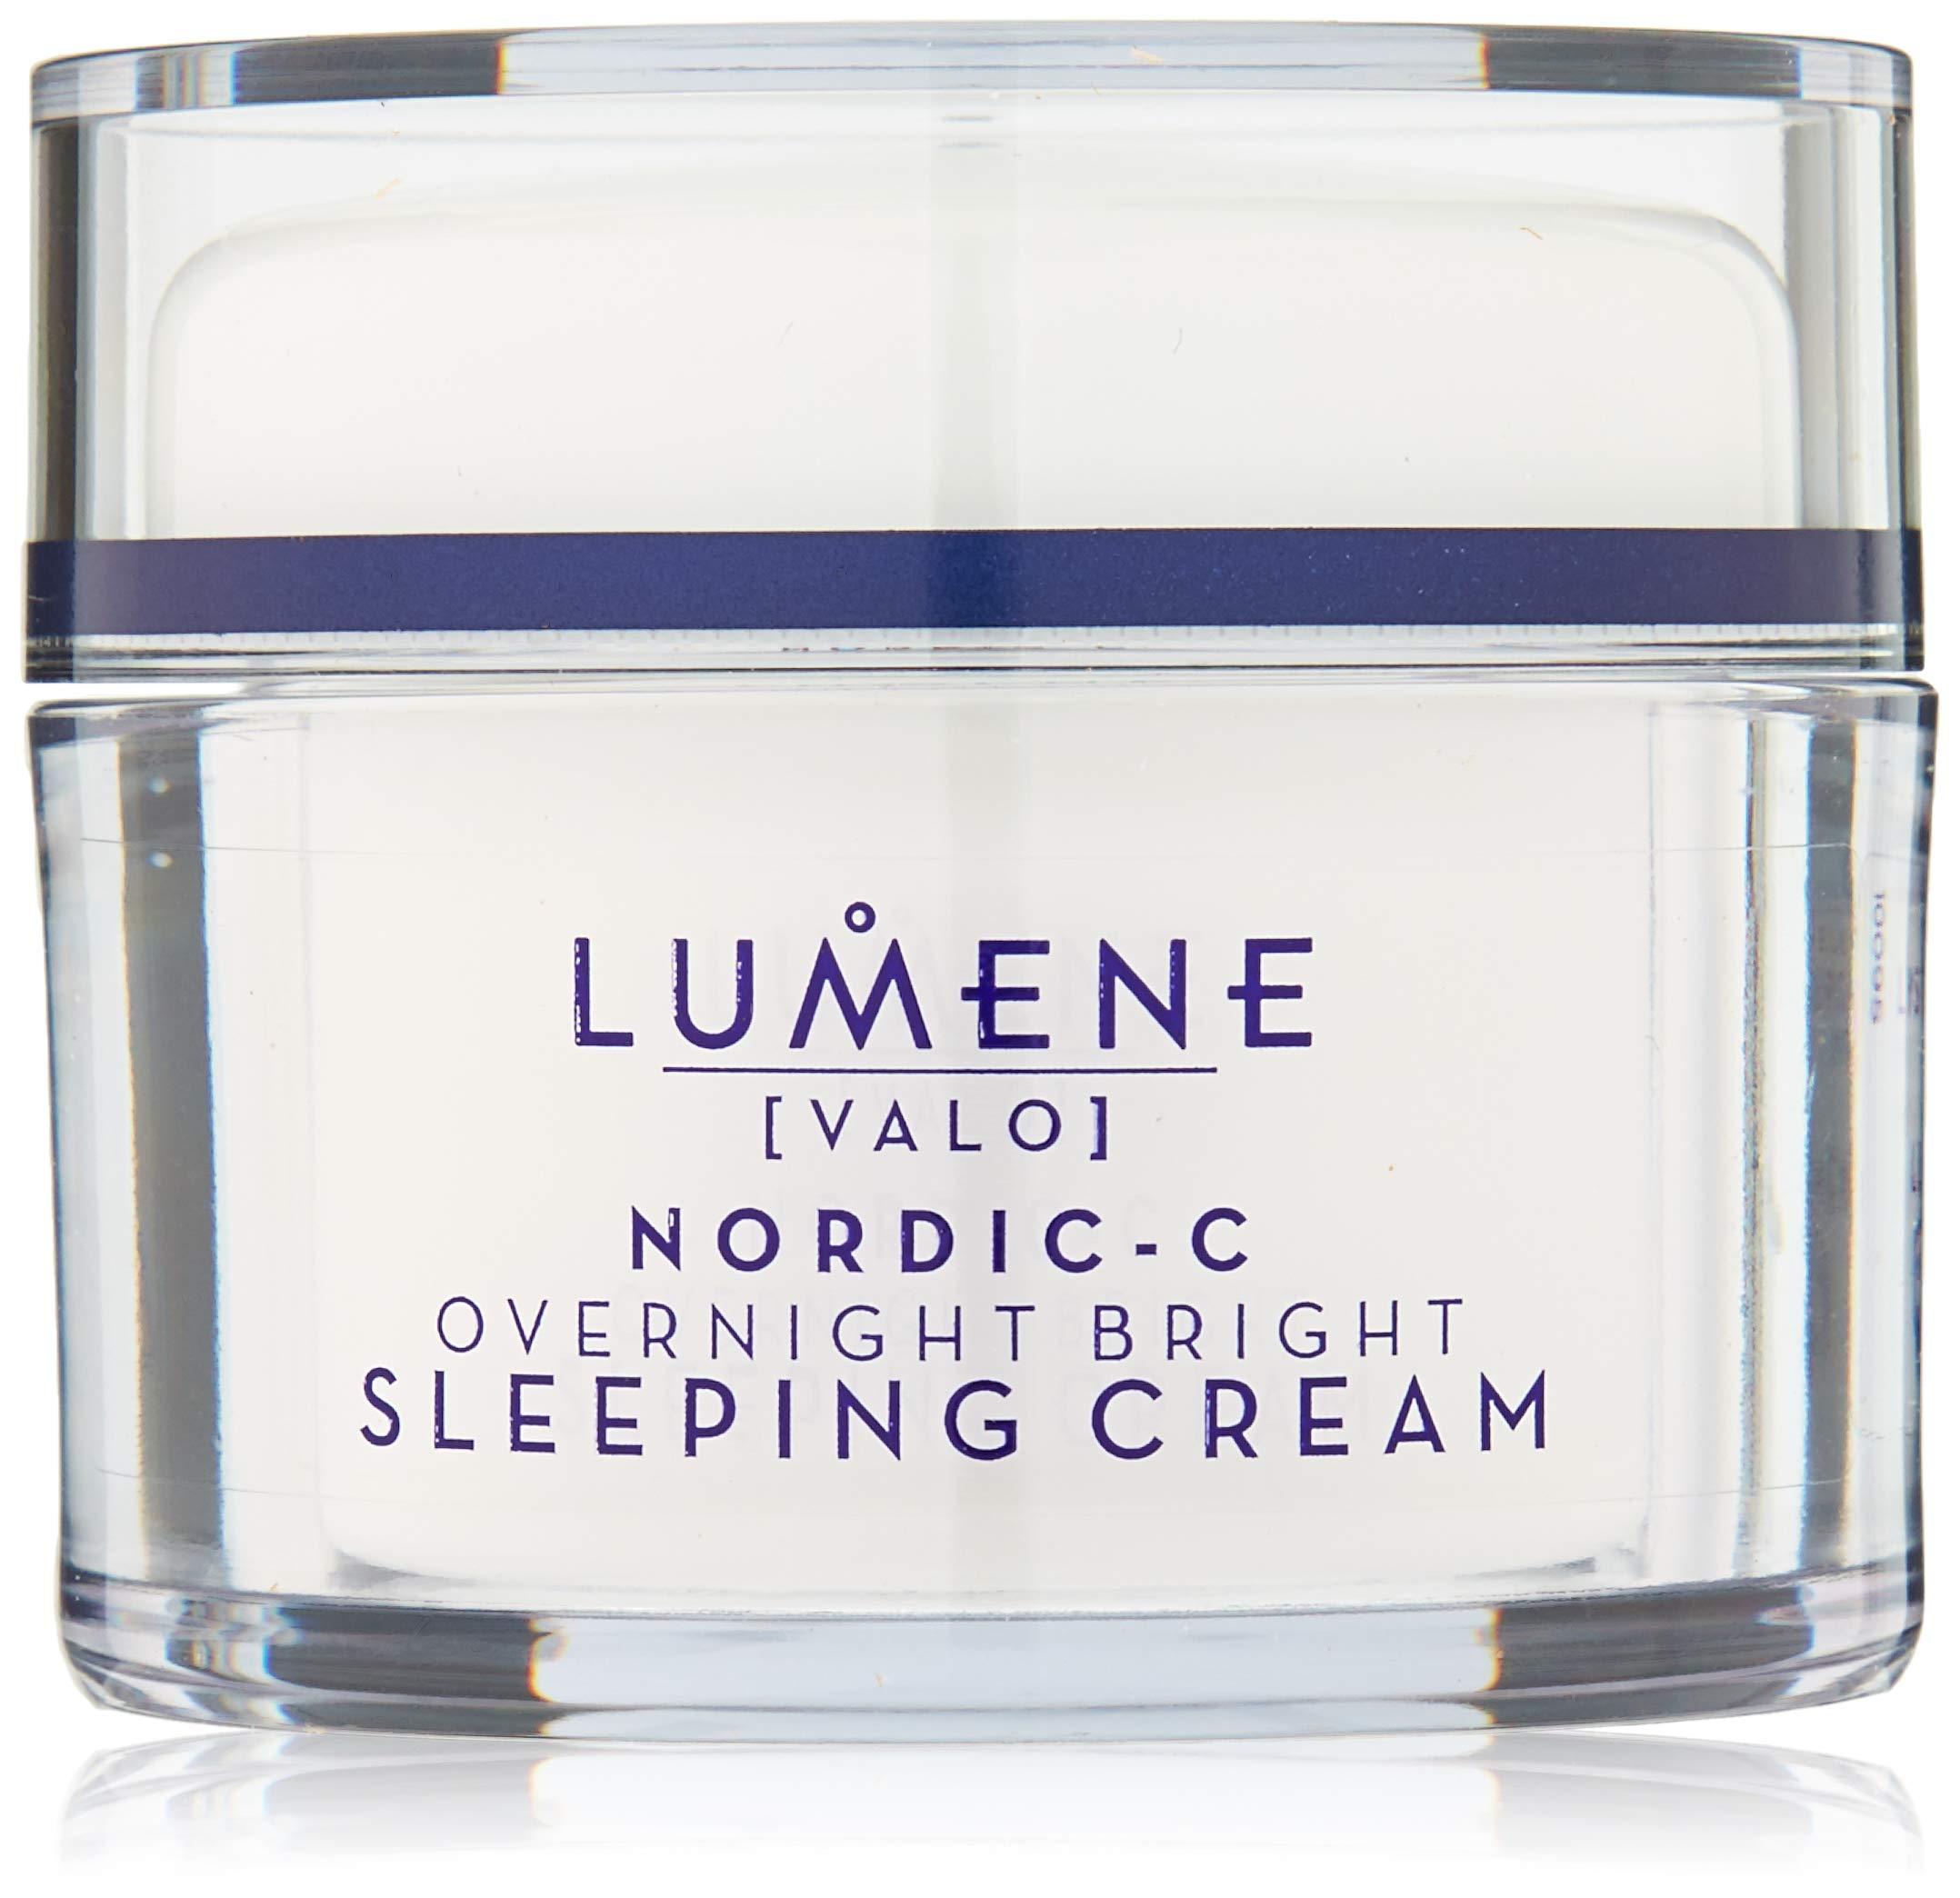 Valo Vitamin C Overnight Bright Sleeping Cream 1.7 fl oz by Lumene